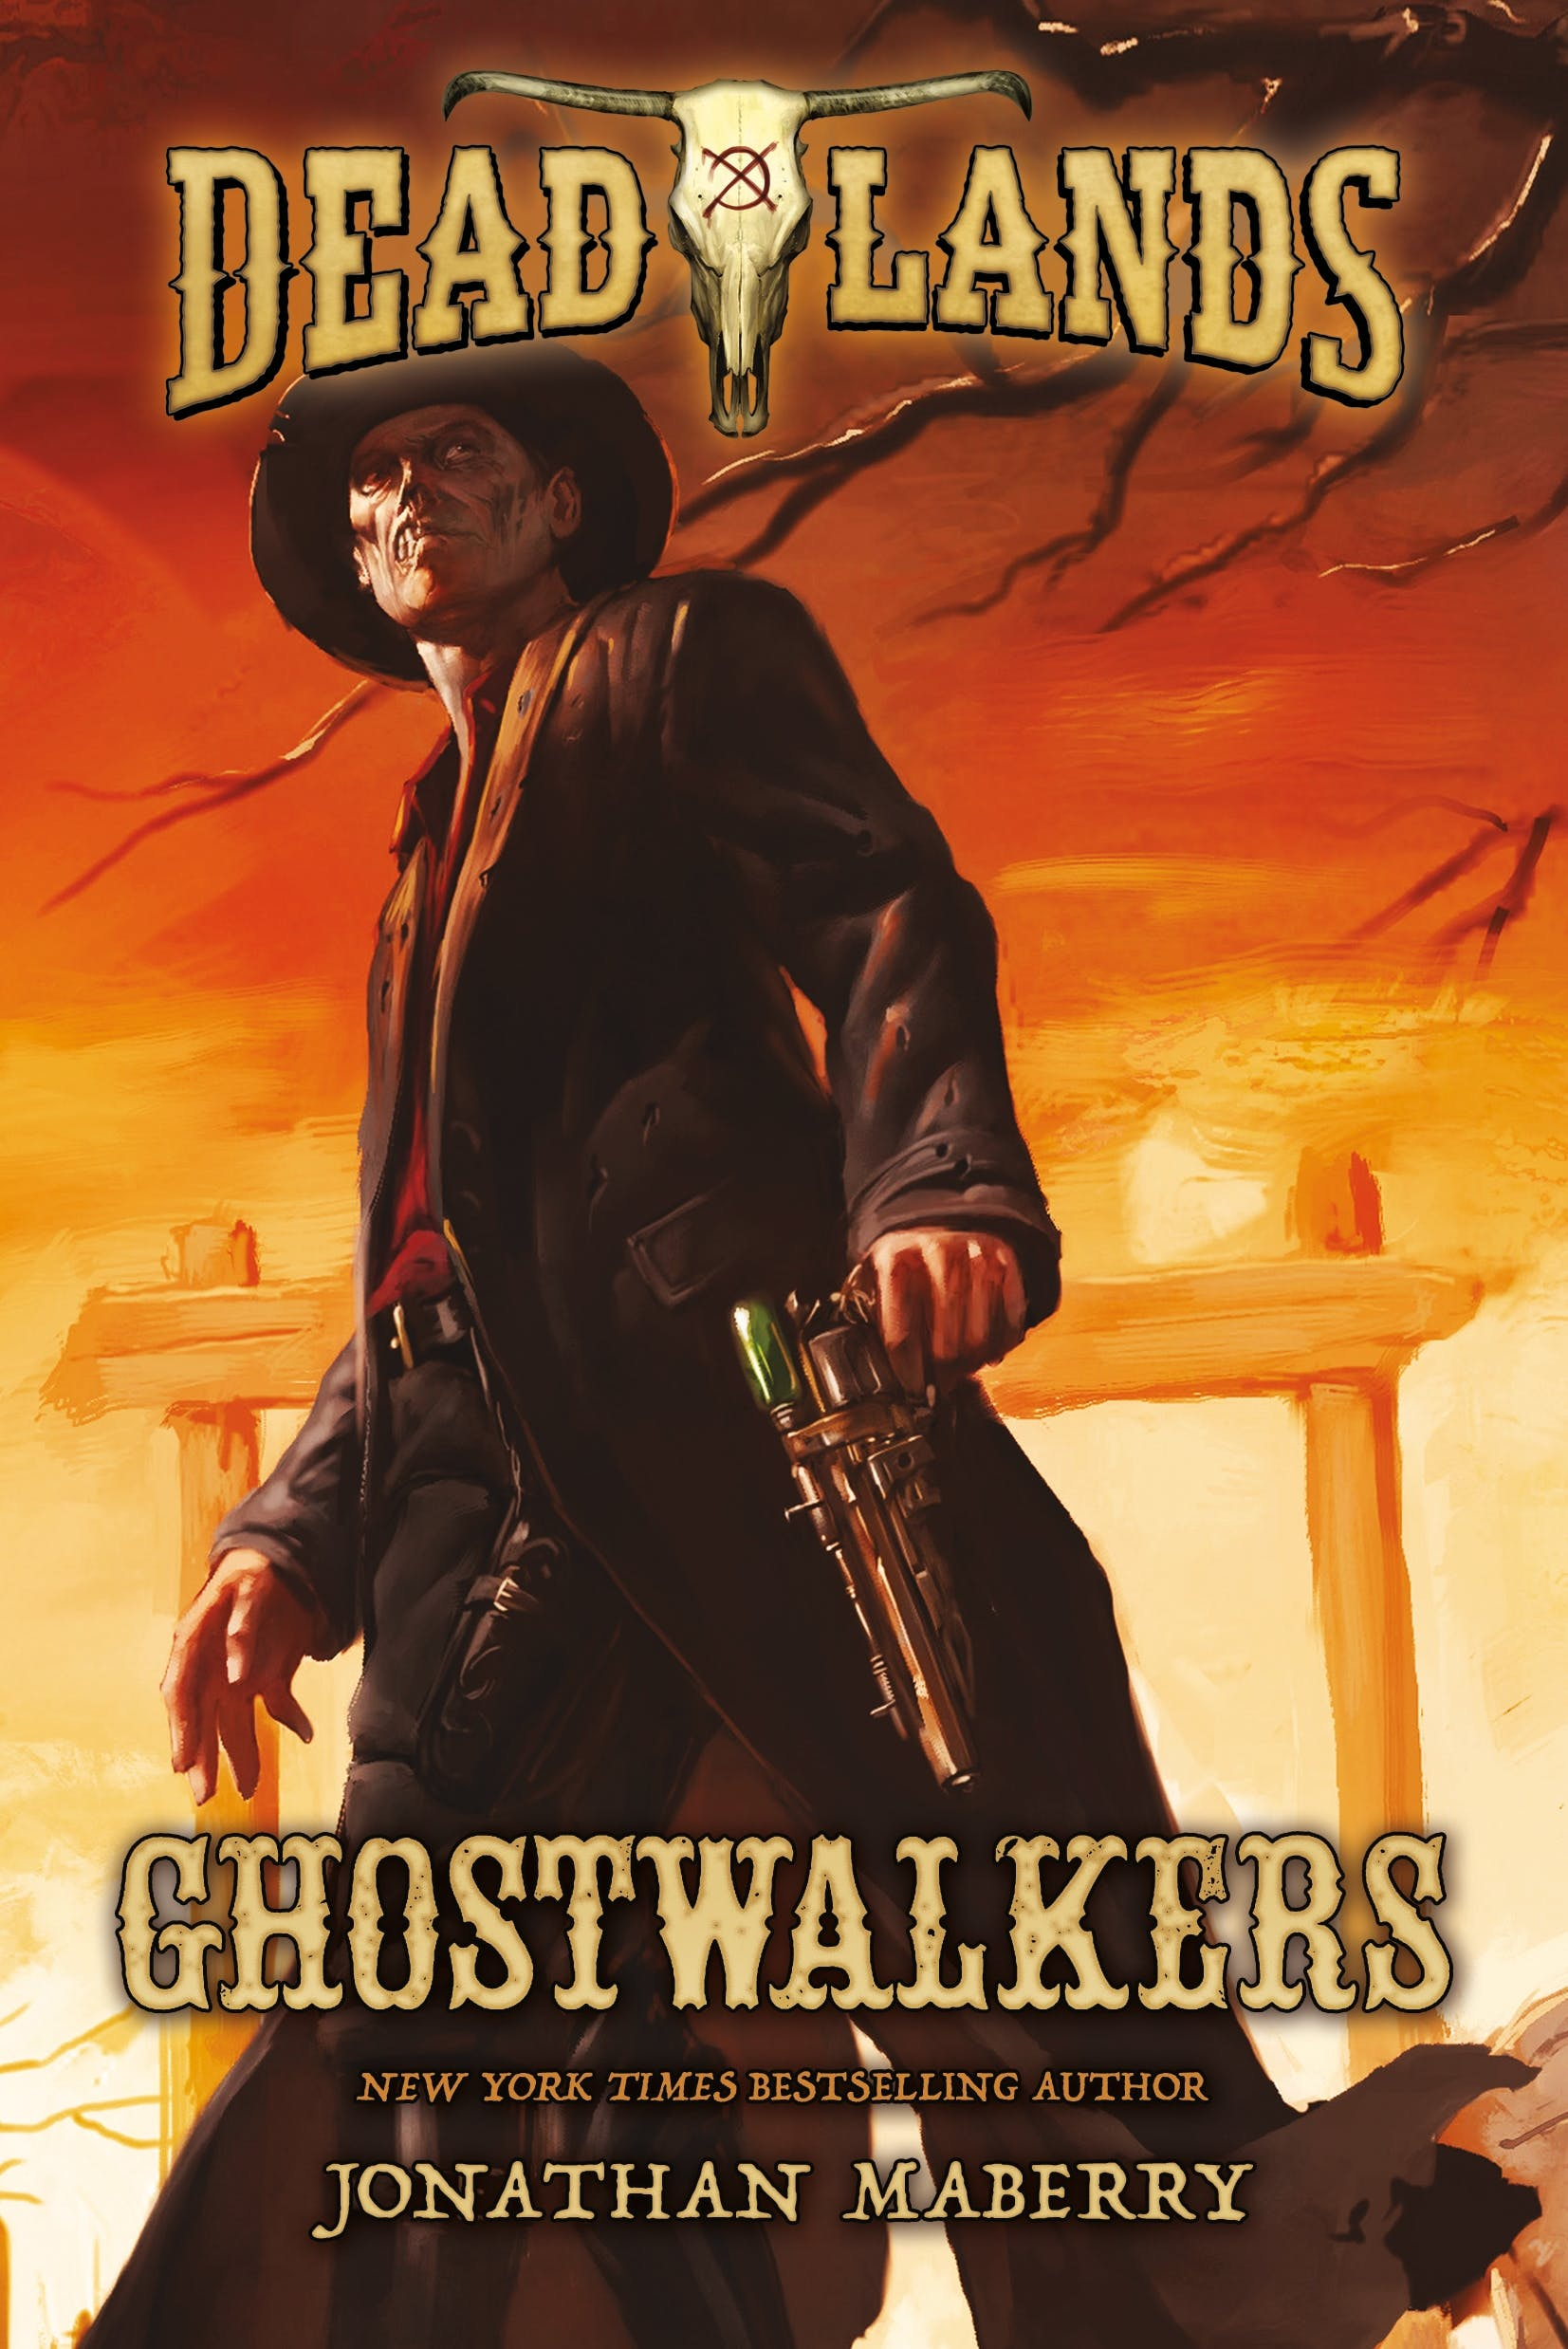 Image of Deadlands: Ghostwalkers